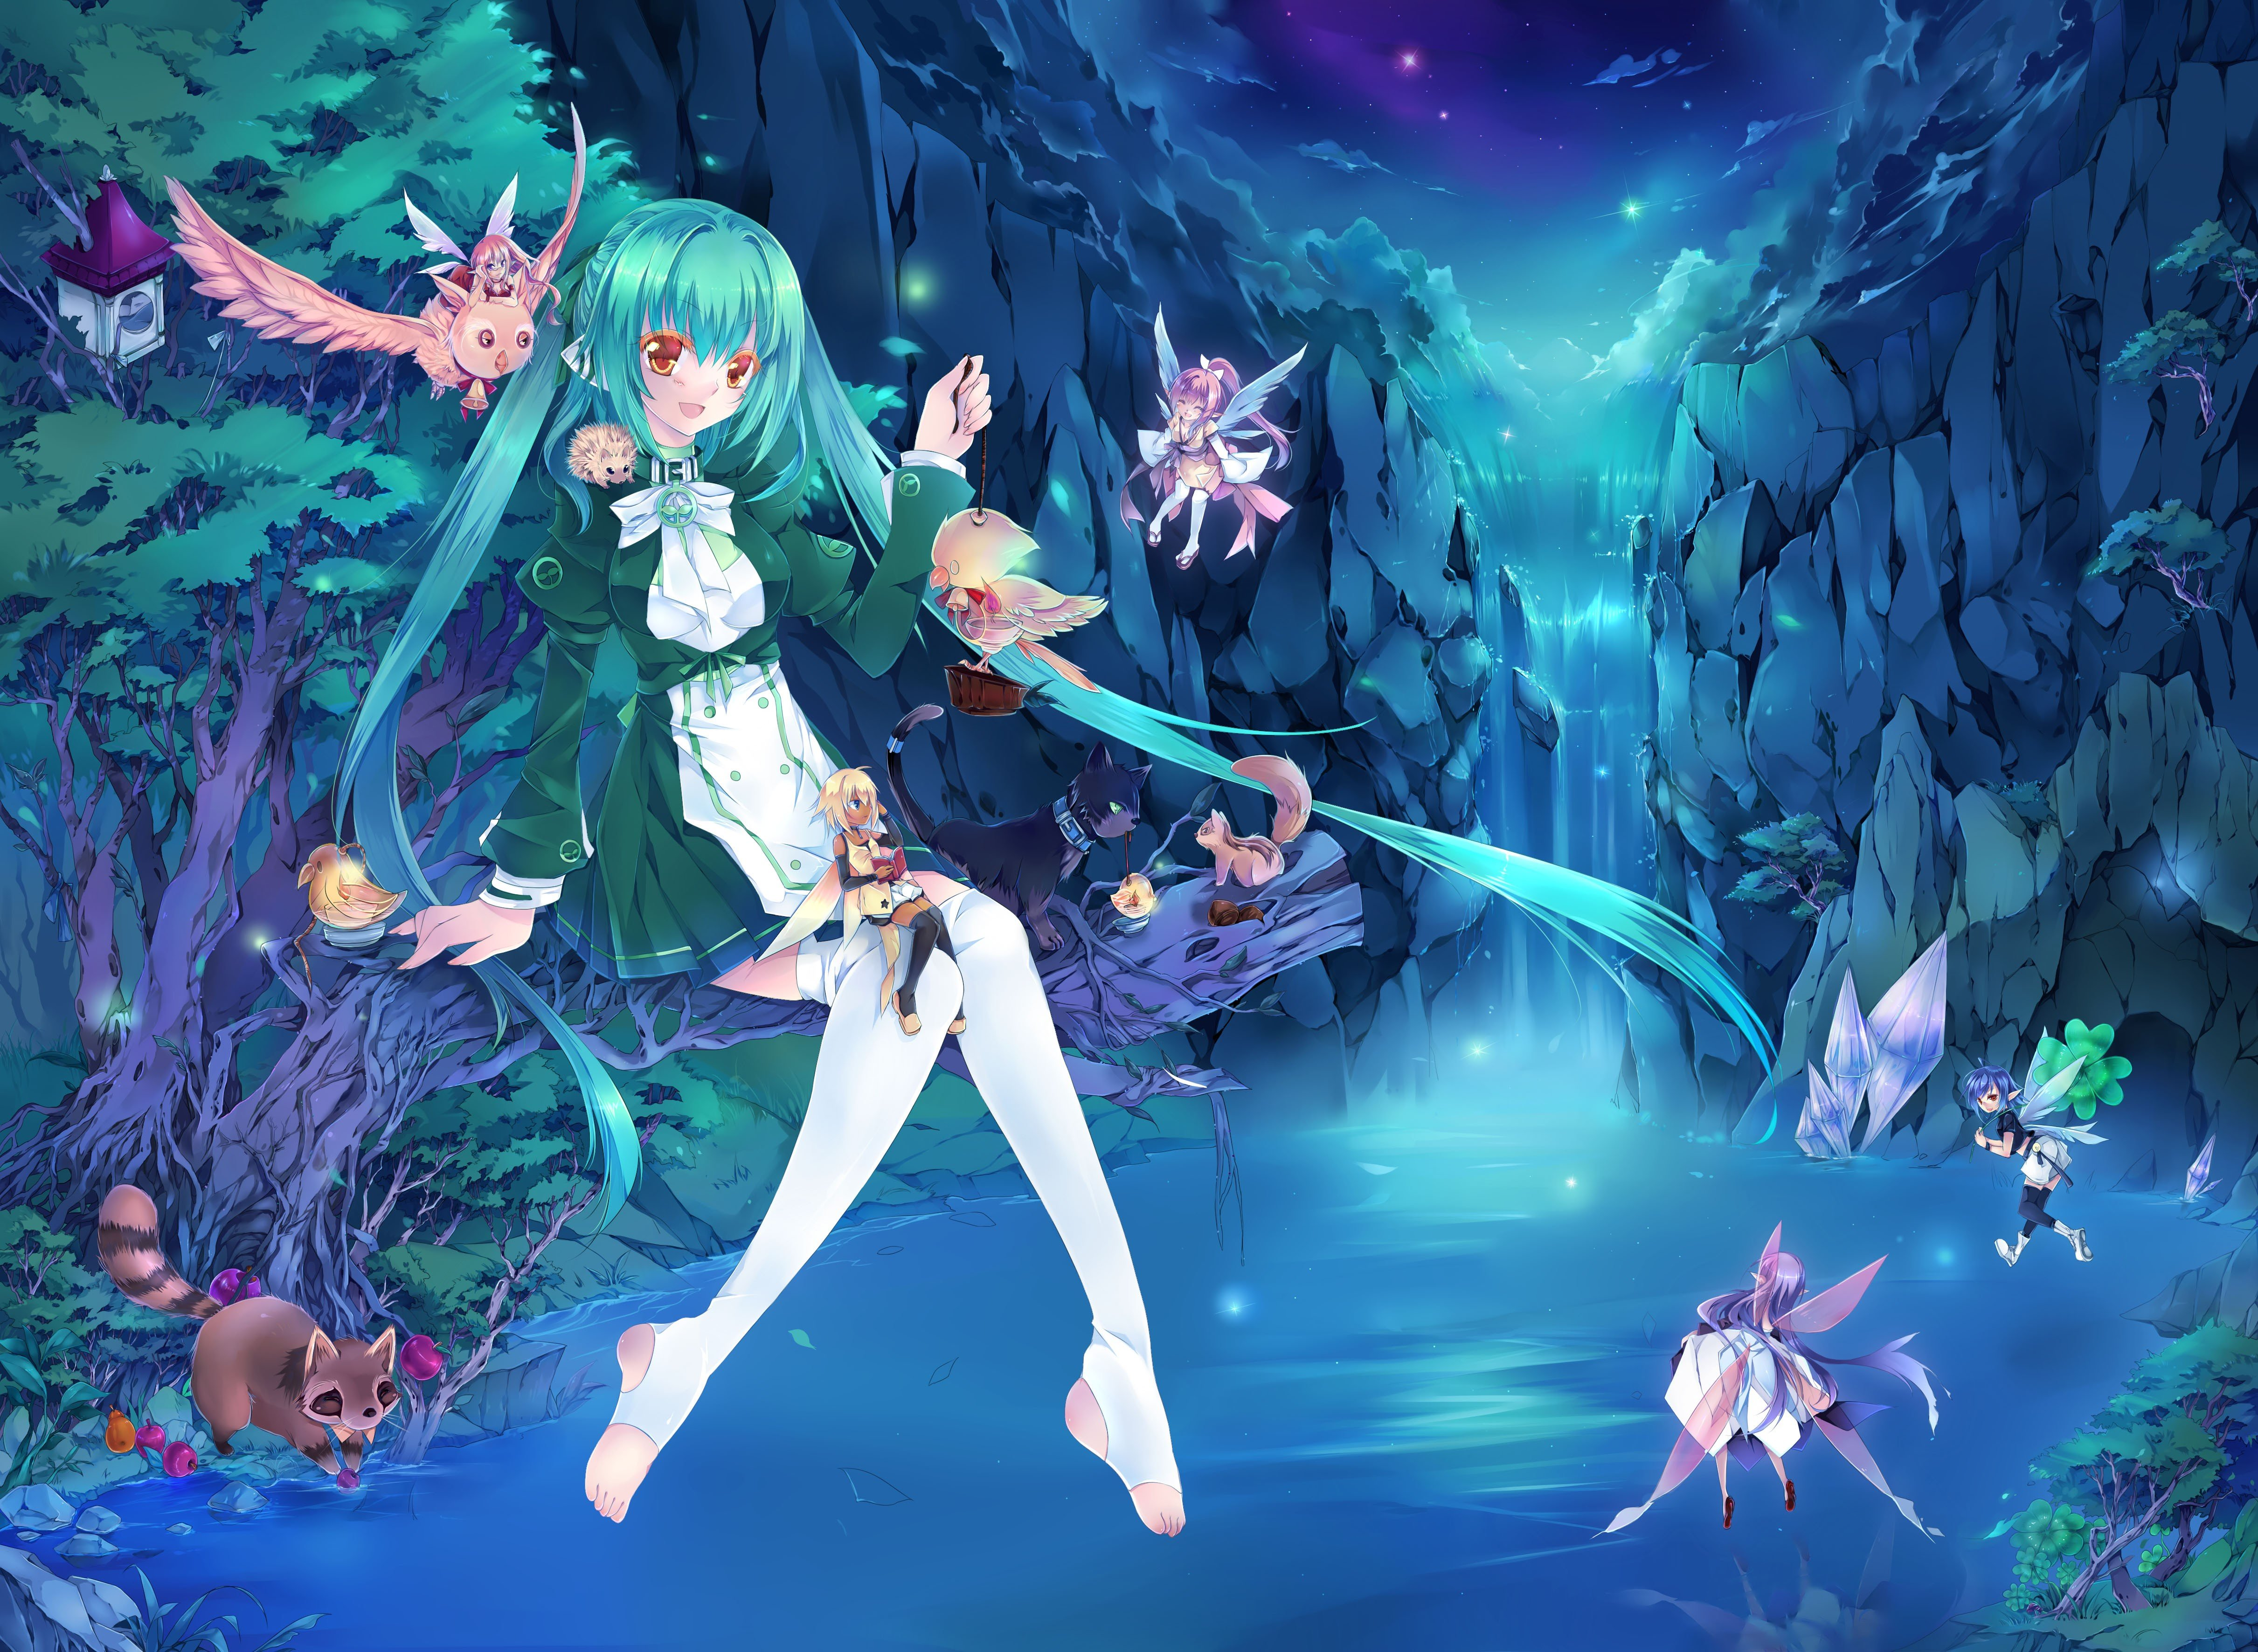 Water nature wings animals long hair fairies thigh highs aqua hair anime girls wallpaper 4842x3543 284062 wallpaperup